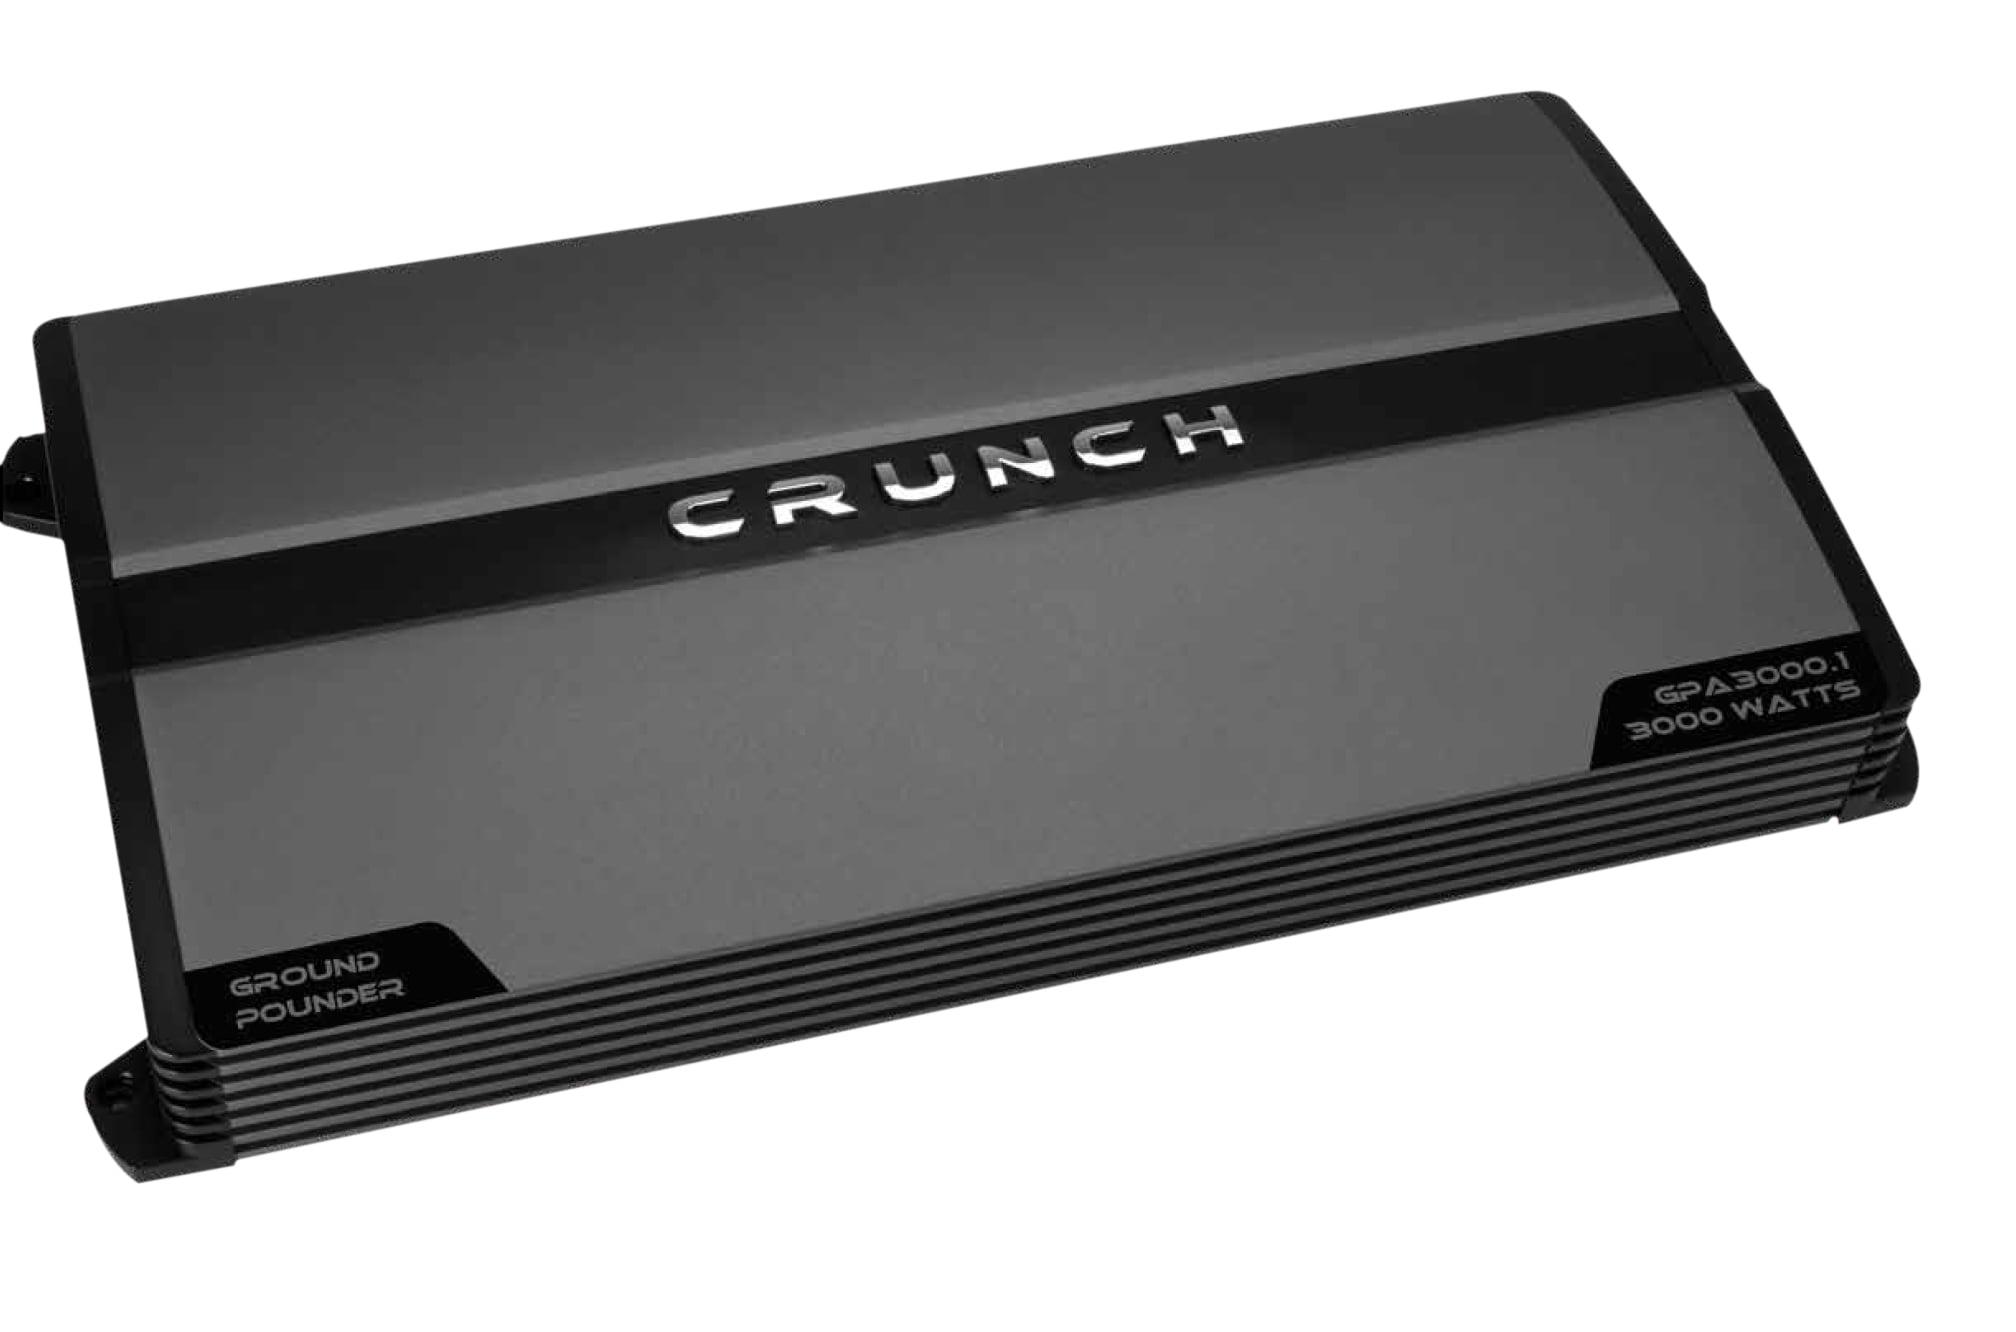 Crunch GPA3000.1 Ground Pounder Monoblock Class AB Amp, 3,000 Watts ...